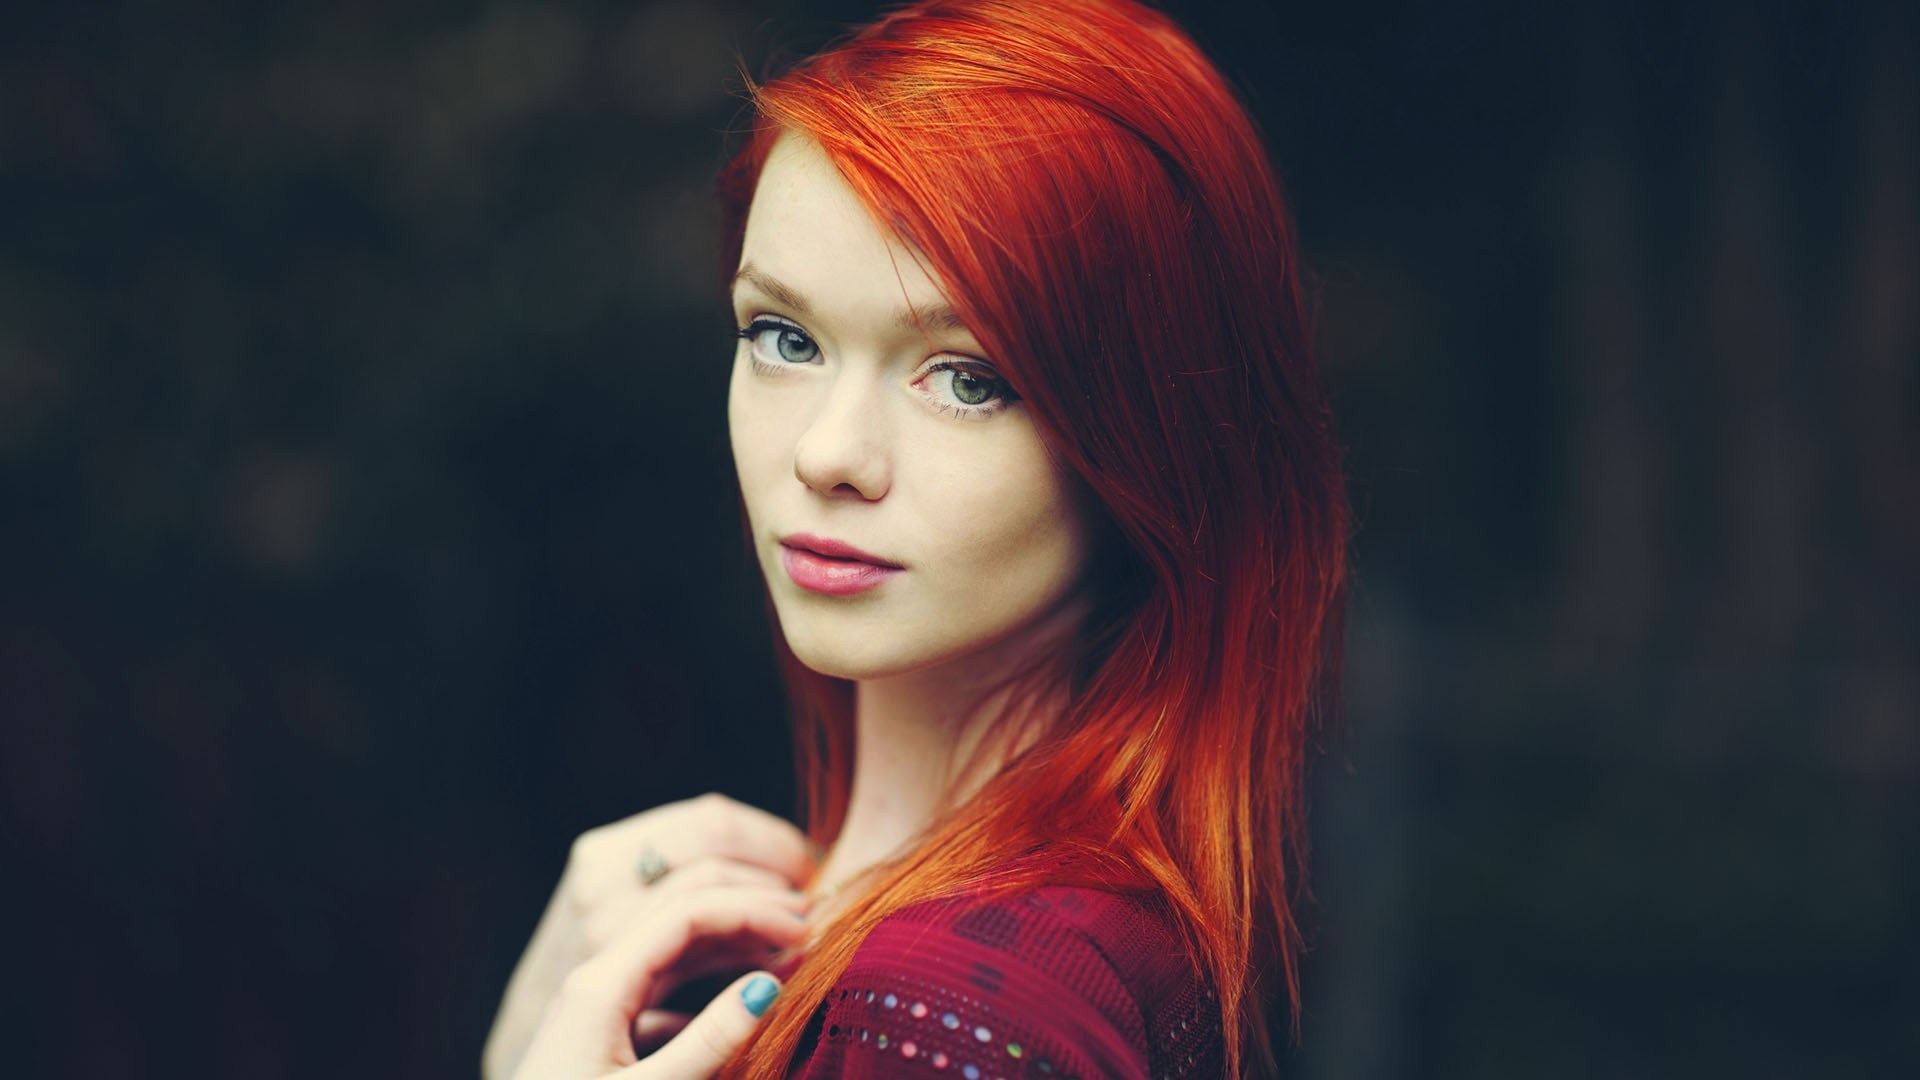 Redhead Girl Model Photo